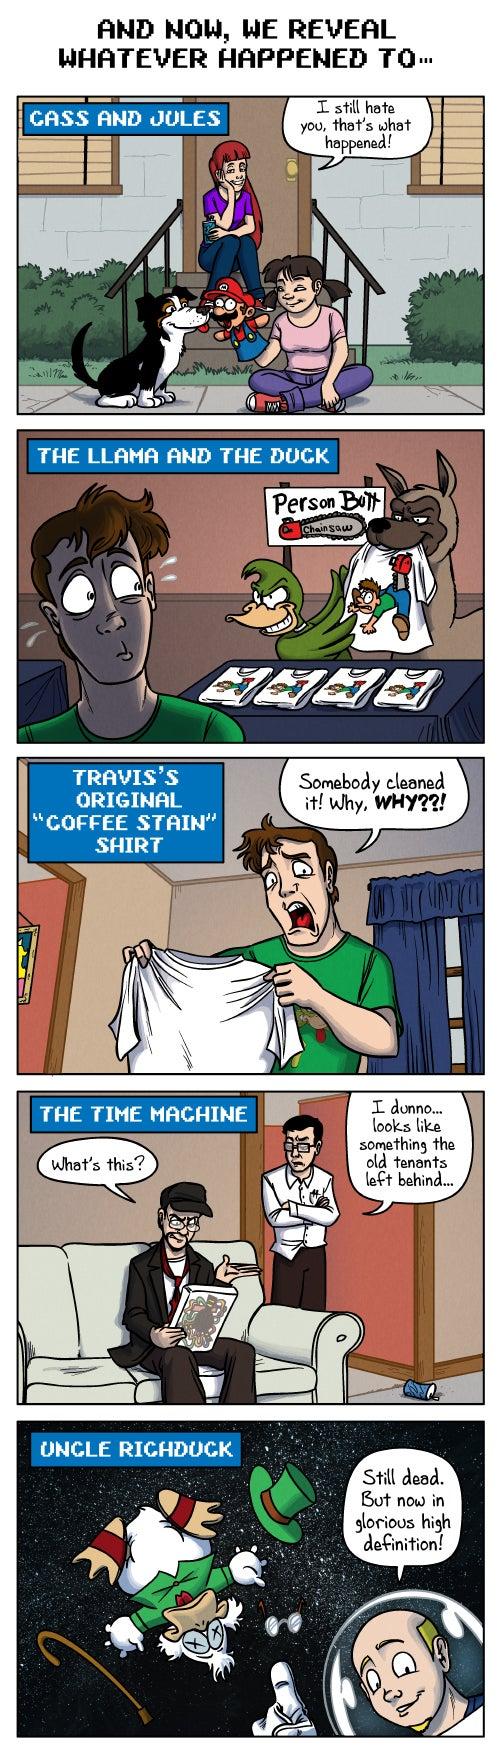 Sunday Comics: The Shape of Things